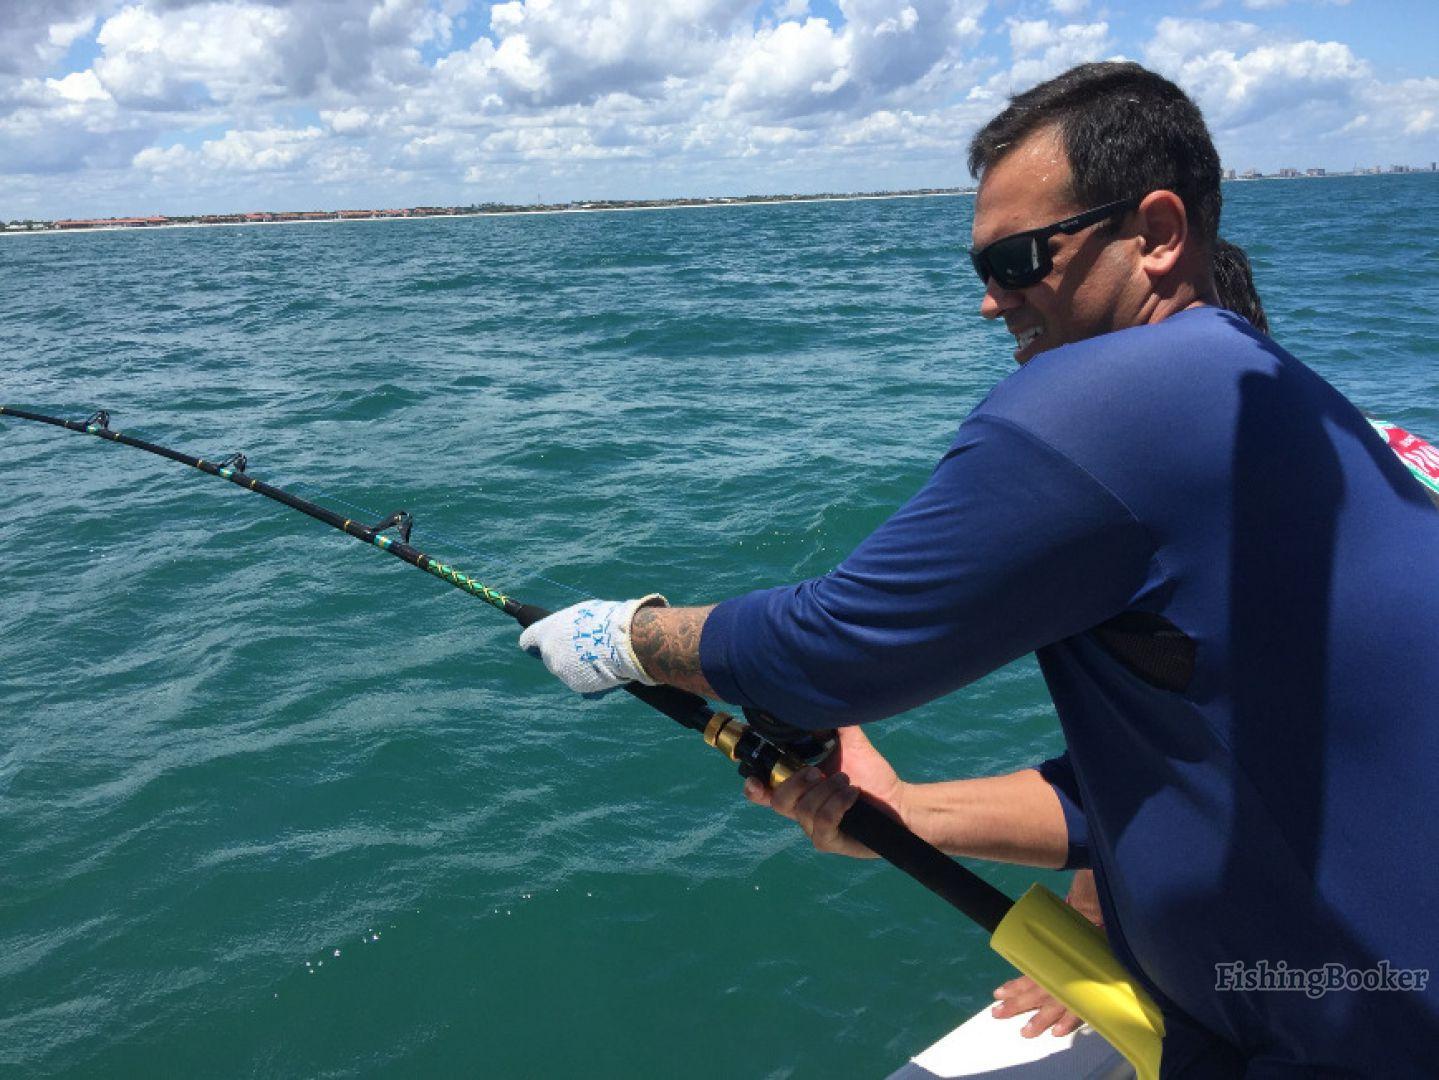 Scuba medic fishing charters st augustine florida for Fishing charters st augustine